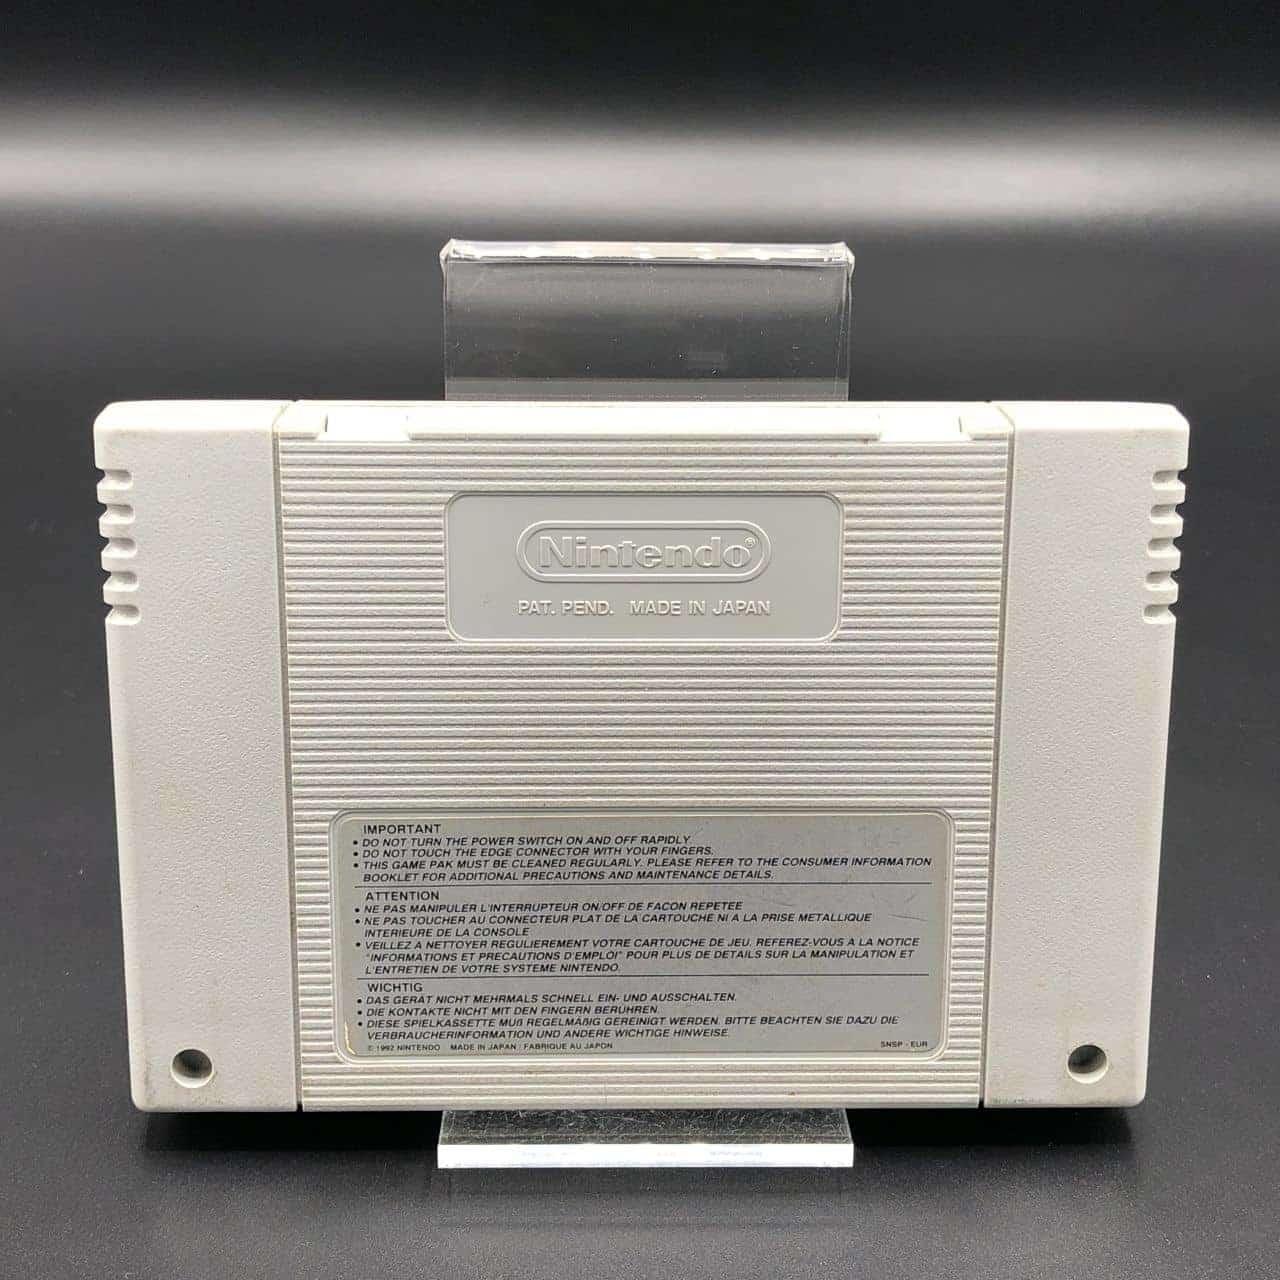 SNES Joe & Mac 3 (Modul) (Gebrauchsspuren) Super Nintendo